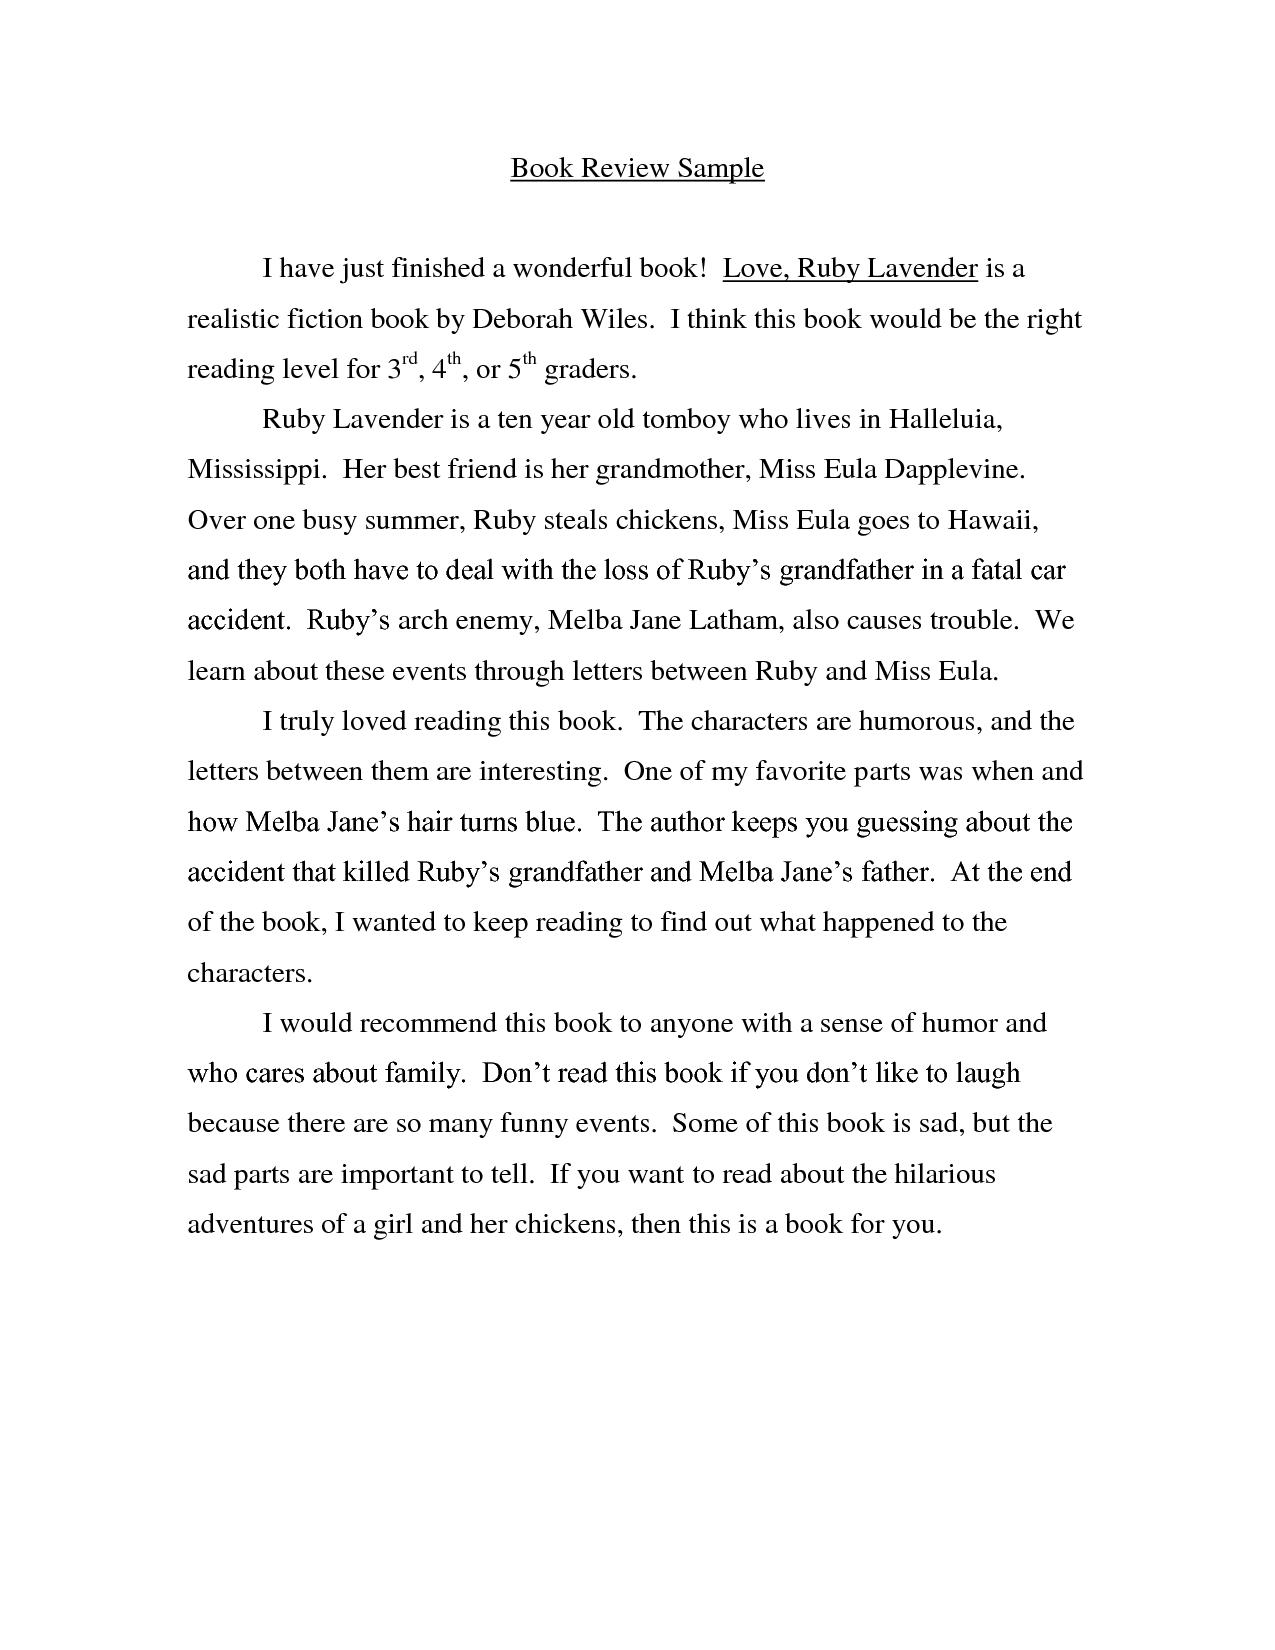 021 Essay Example Fsu Application Remarkable Sample Full